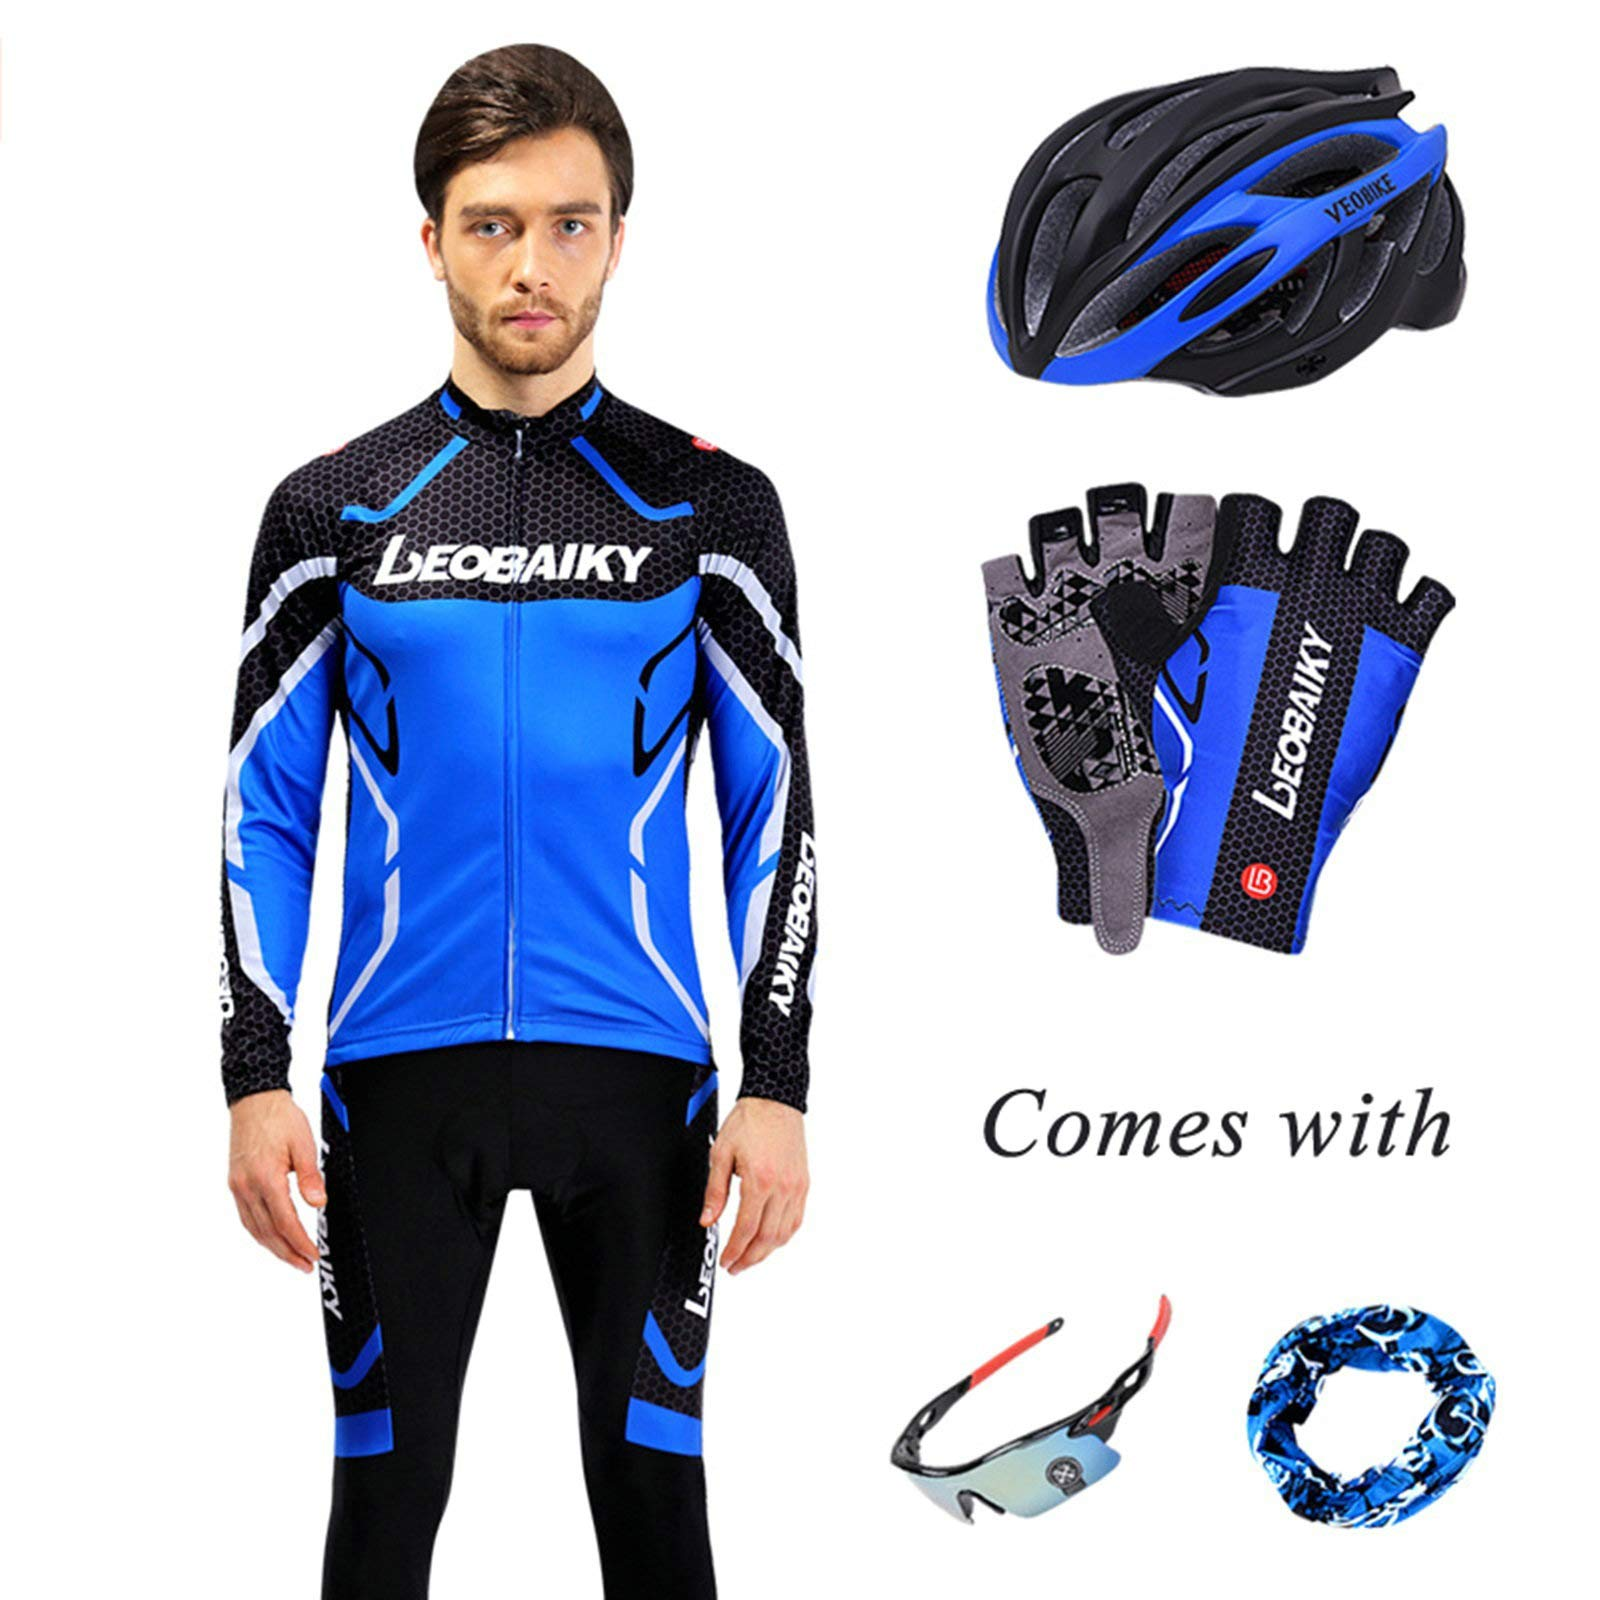 Aooaz Men's Biking Clothing Set Shirt Leggings with Helmet/Gloves/Goggles/Mask Blue S